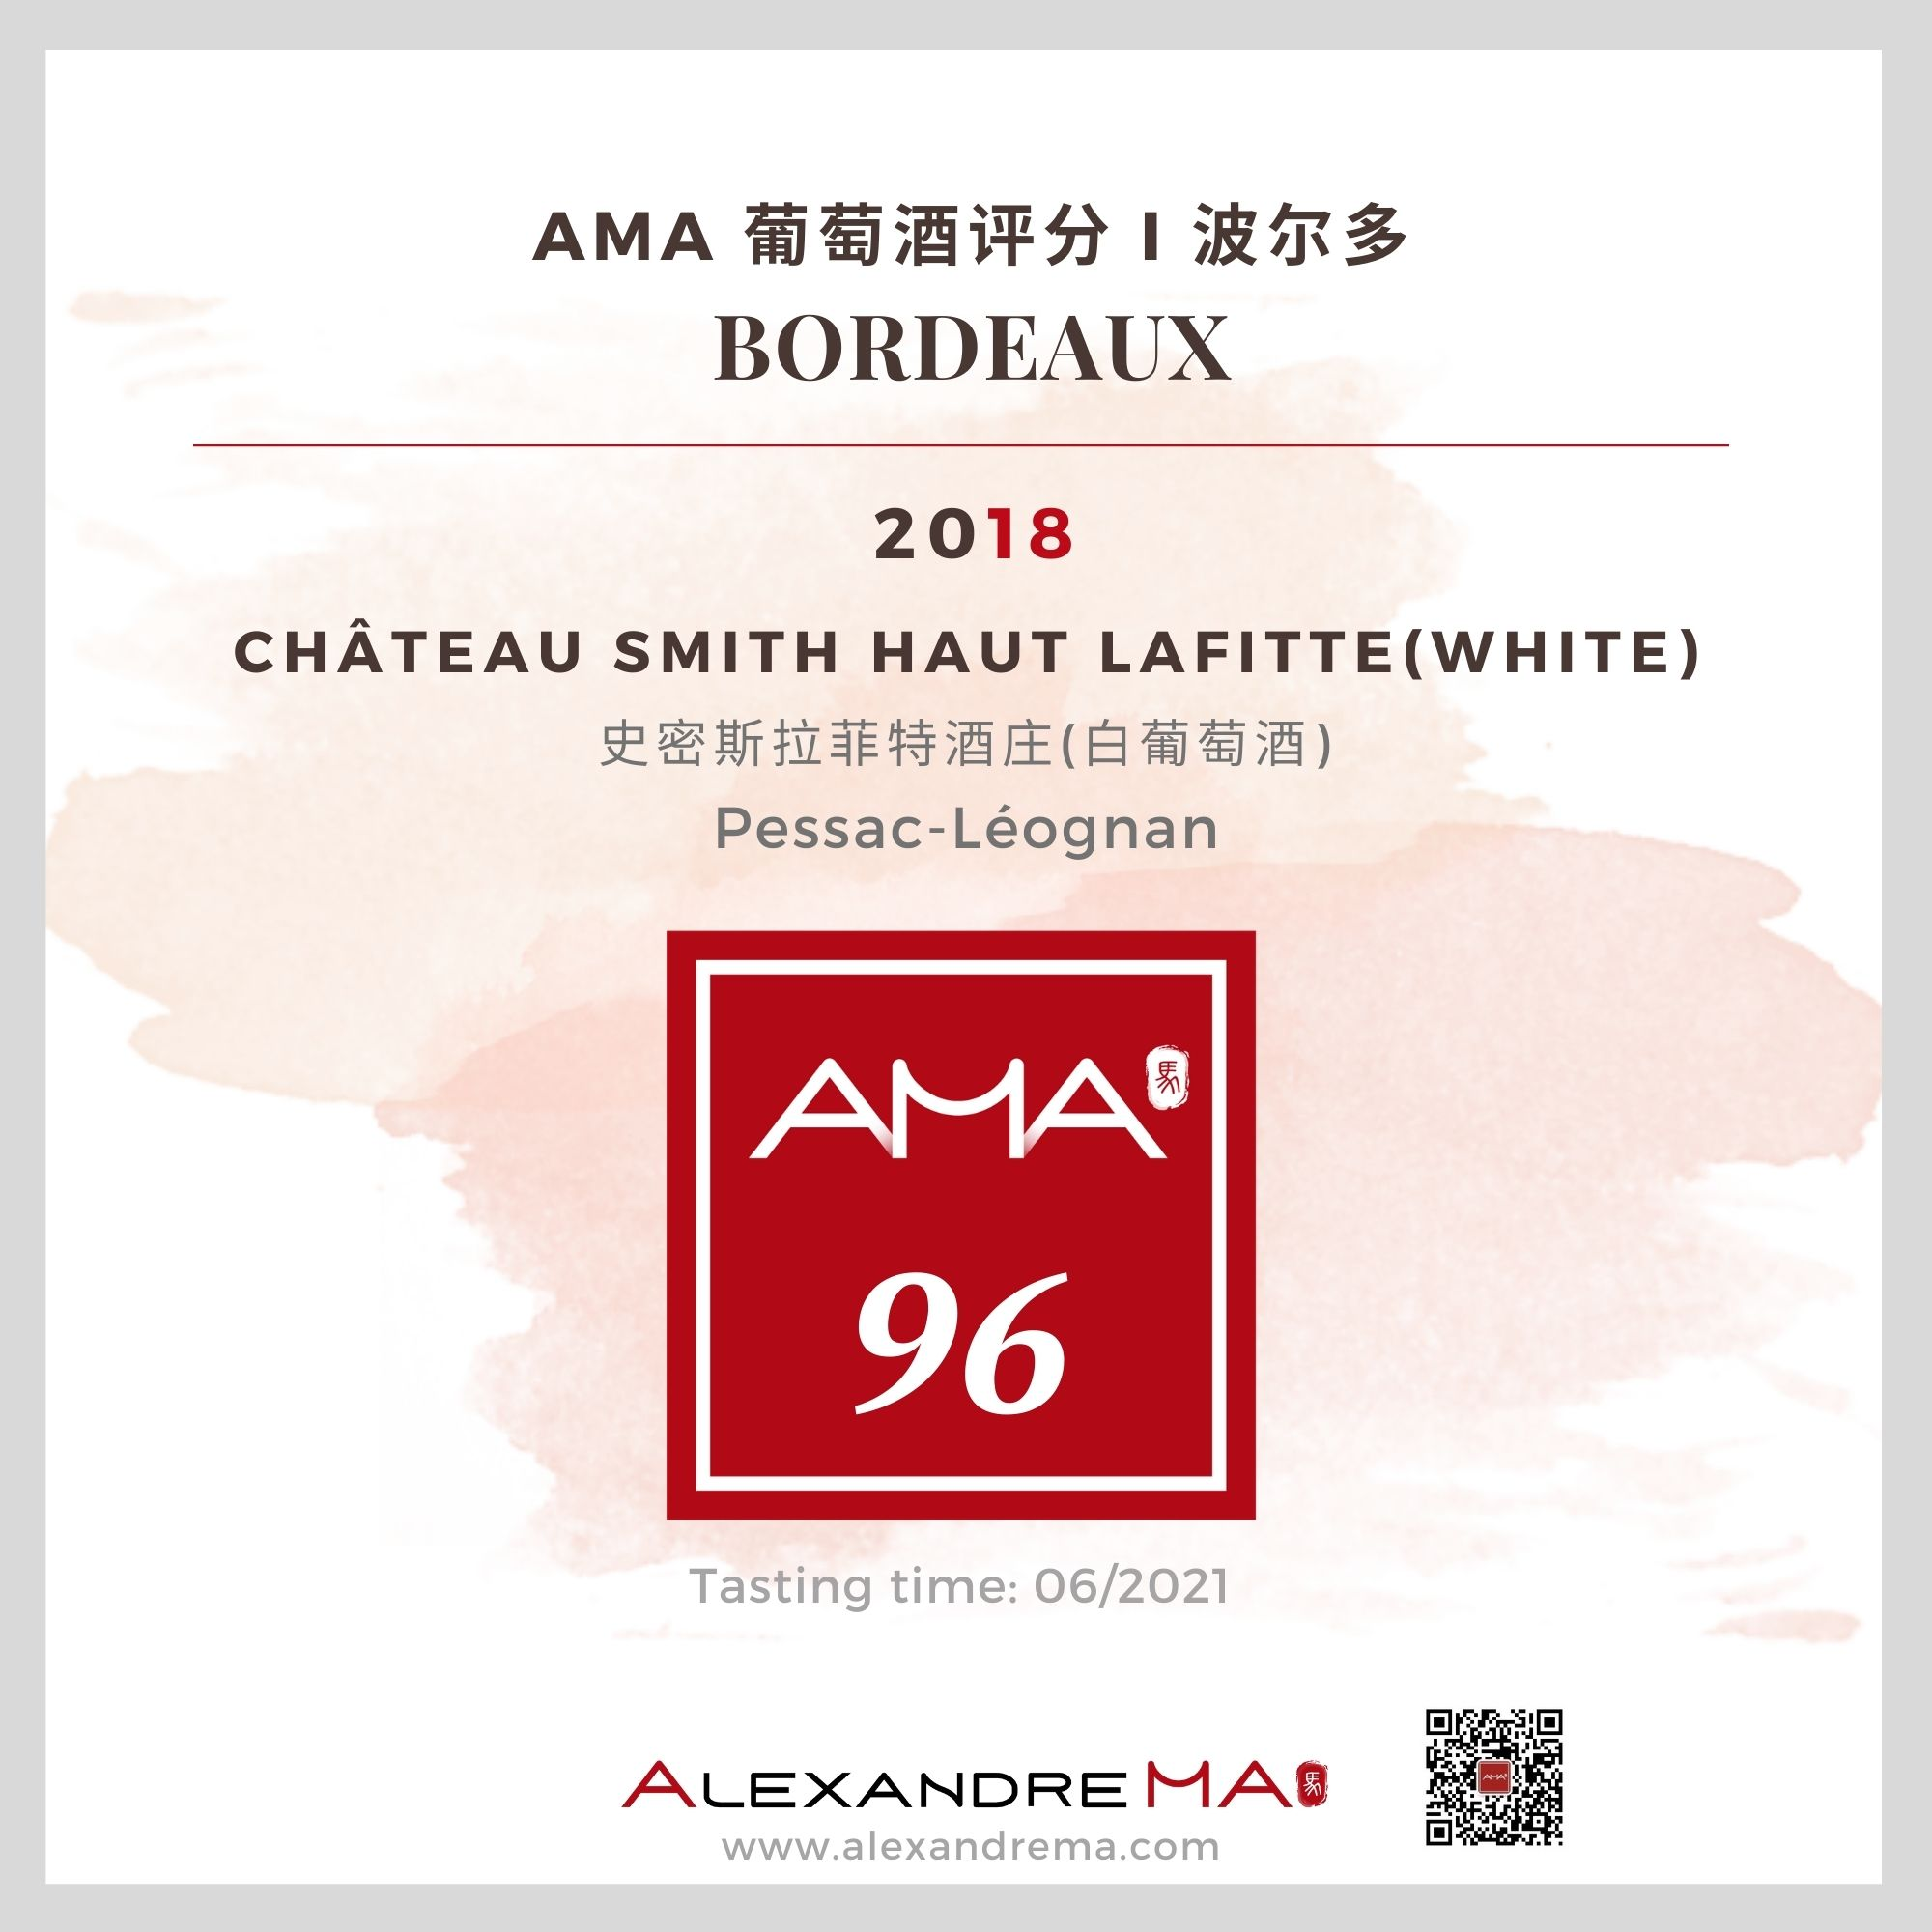 Château Smith Haut Lafitte White 2018 史密斯拉菲特酒庄 - Alexandre Ma